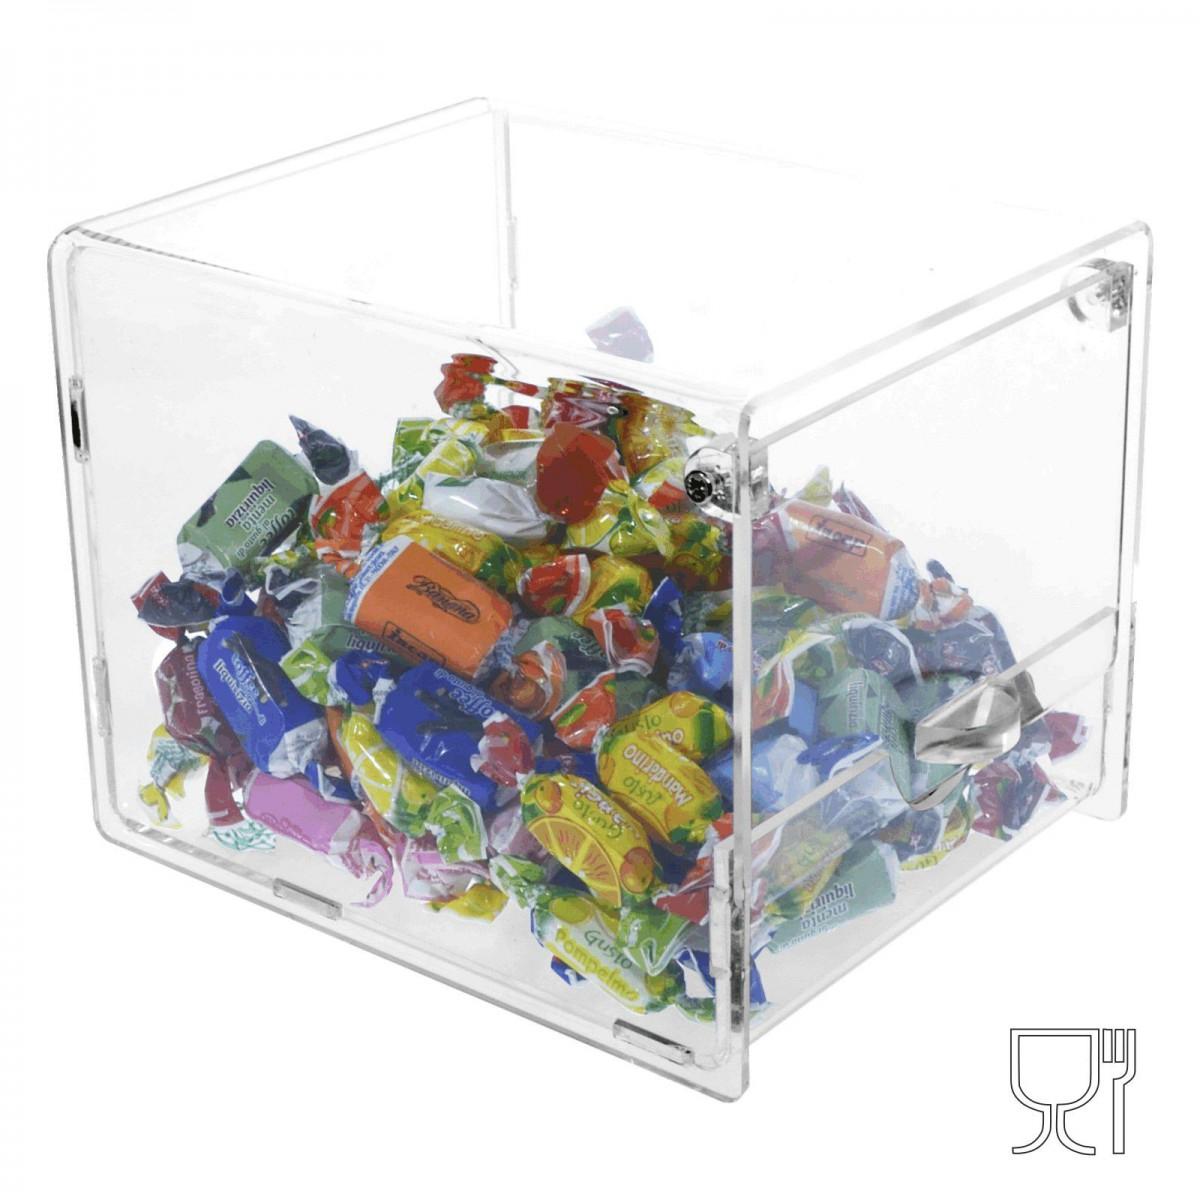 Porta caramelle  trasparente con sportello - 15 x 20 x H15